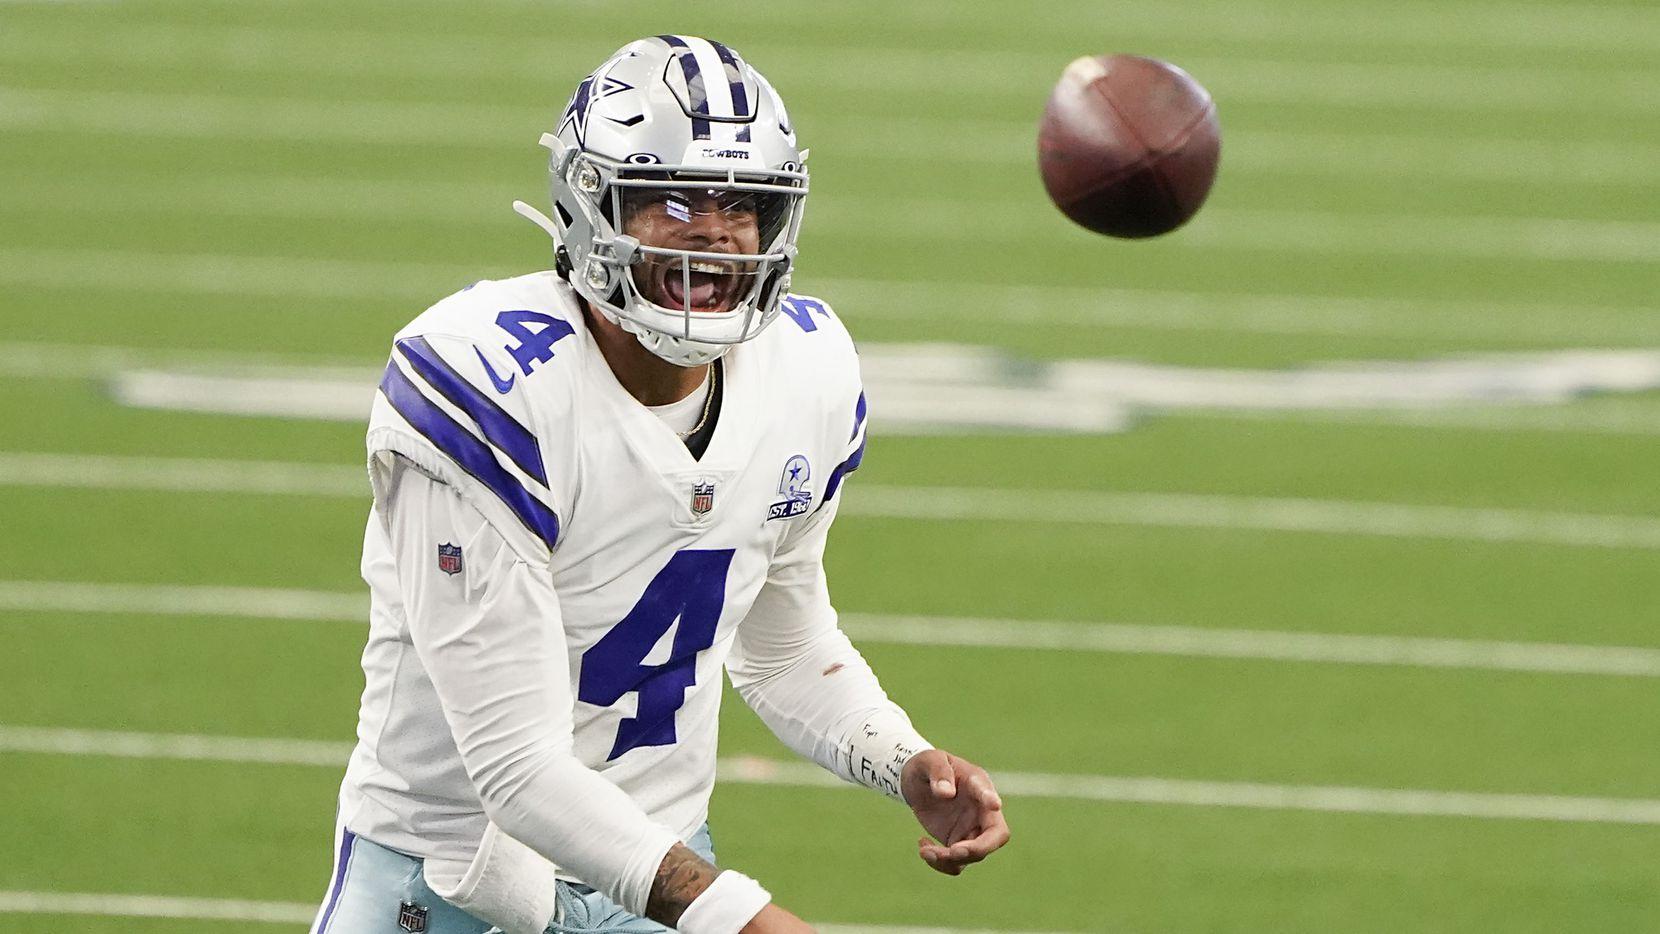 Dallas Cowboys quarterback Dak Prescott throws a pass during the second quarter of an NFL football game Atlanta Falcons at AT&T Stadium on Sunday, Sept. 20, 2020, in Arlington. (Smiley N. Pool/The Dallas Morning News)